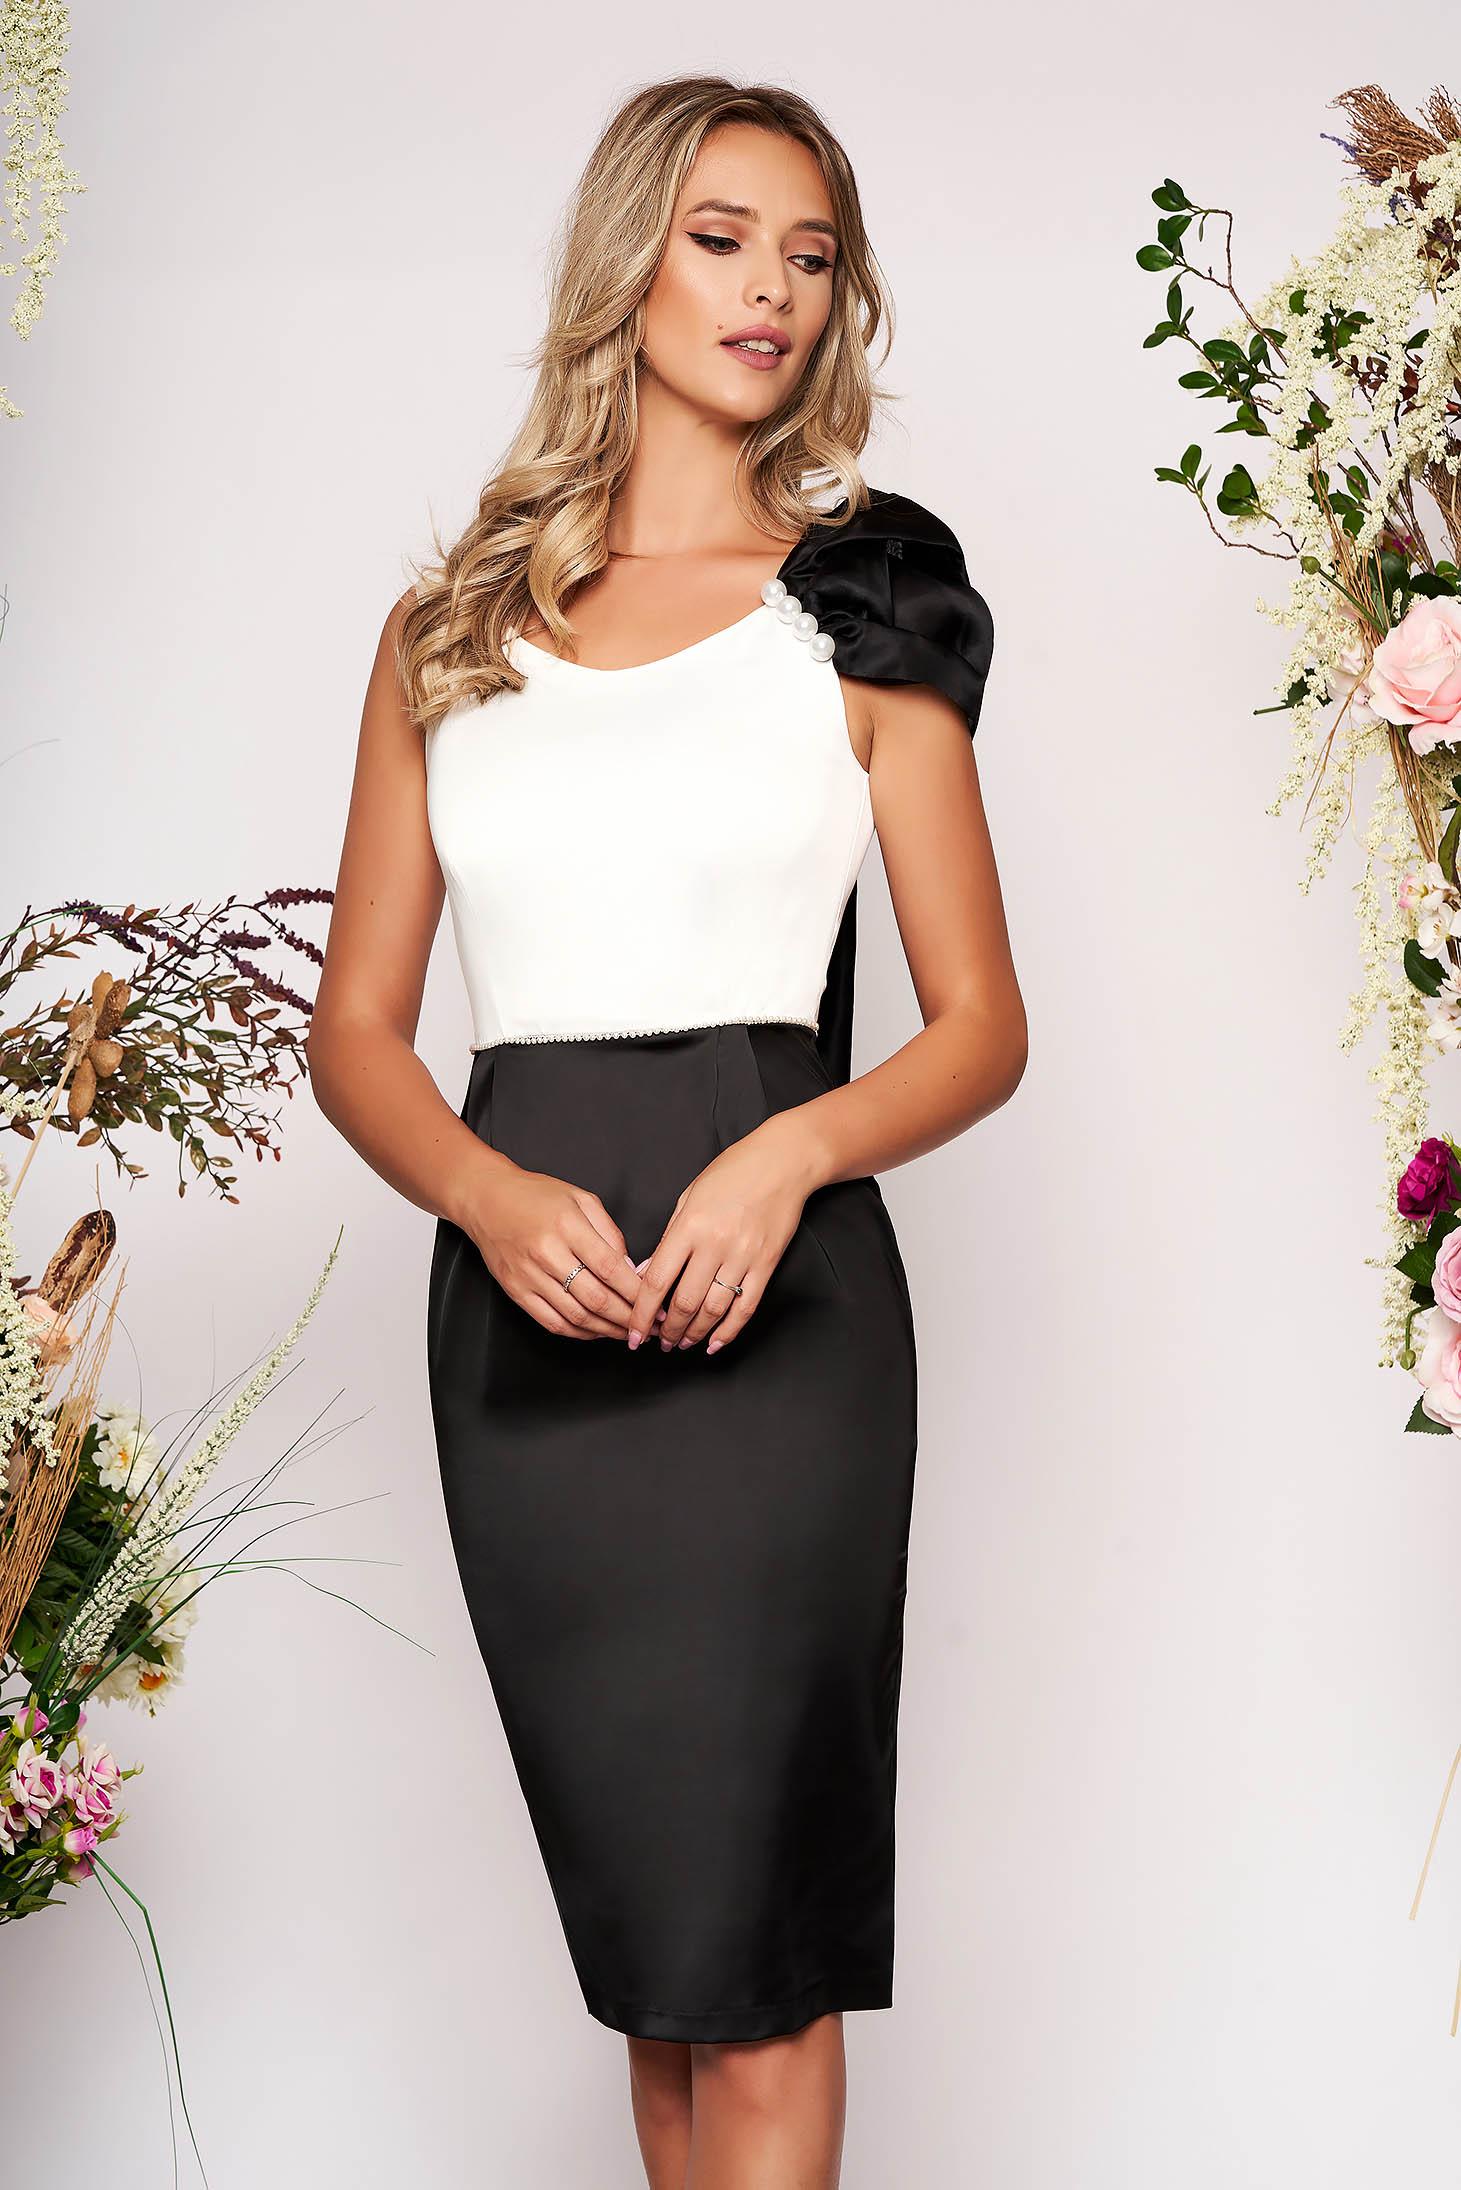 Rochie PrettyGirl neagra midi eleganta de ocazie tip creion din material satinat cu accesoriu inclus